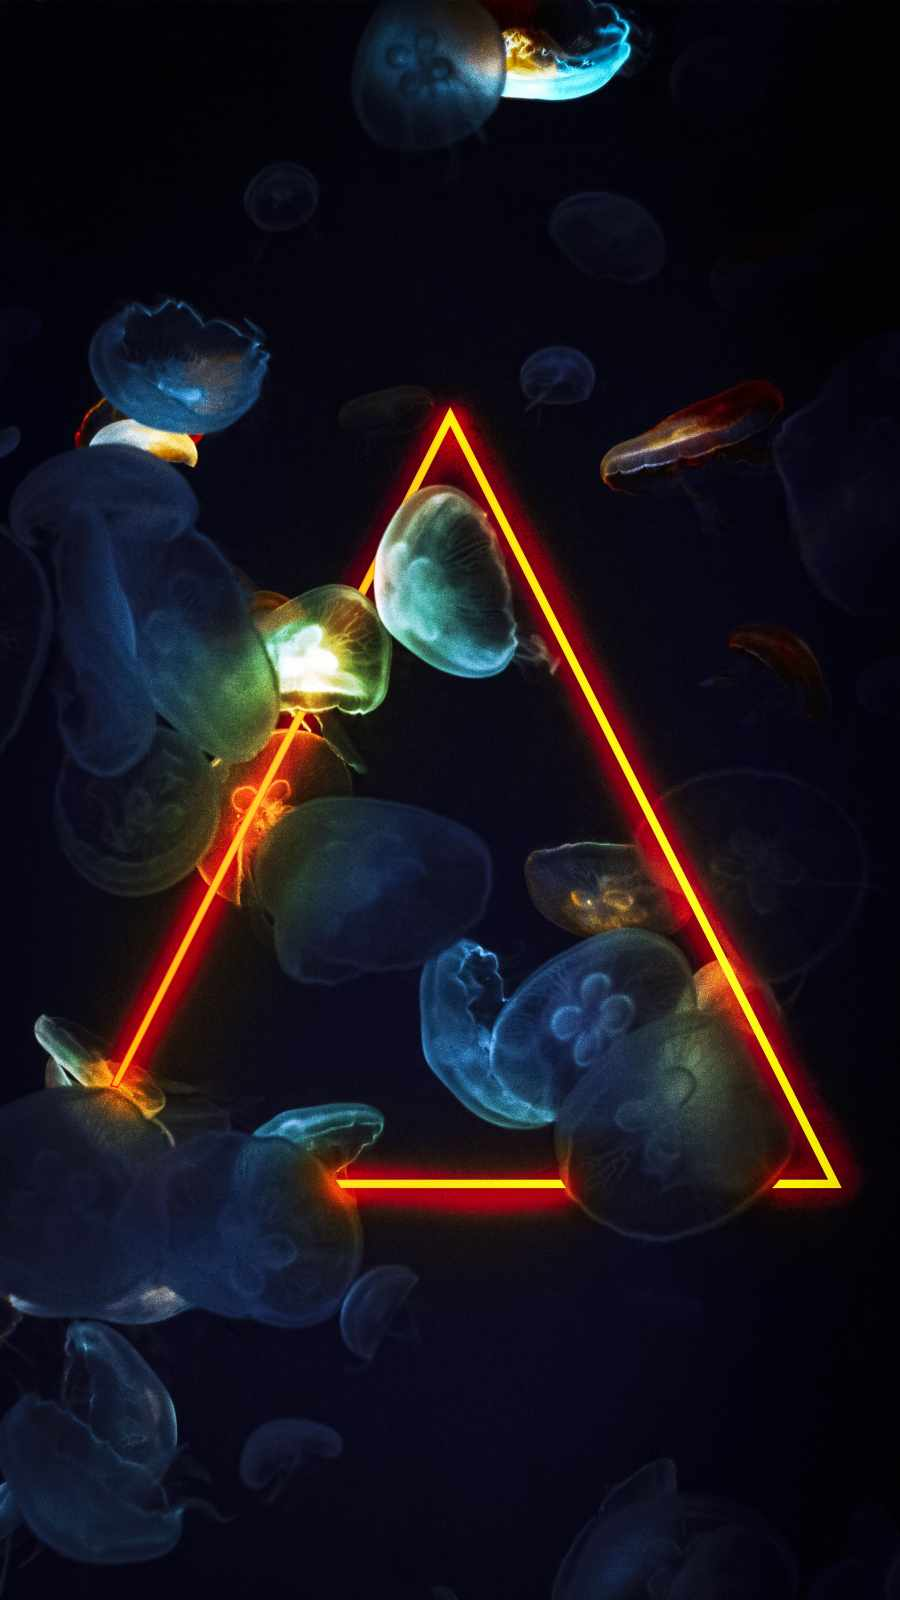 Neon Triangle Jellyfish